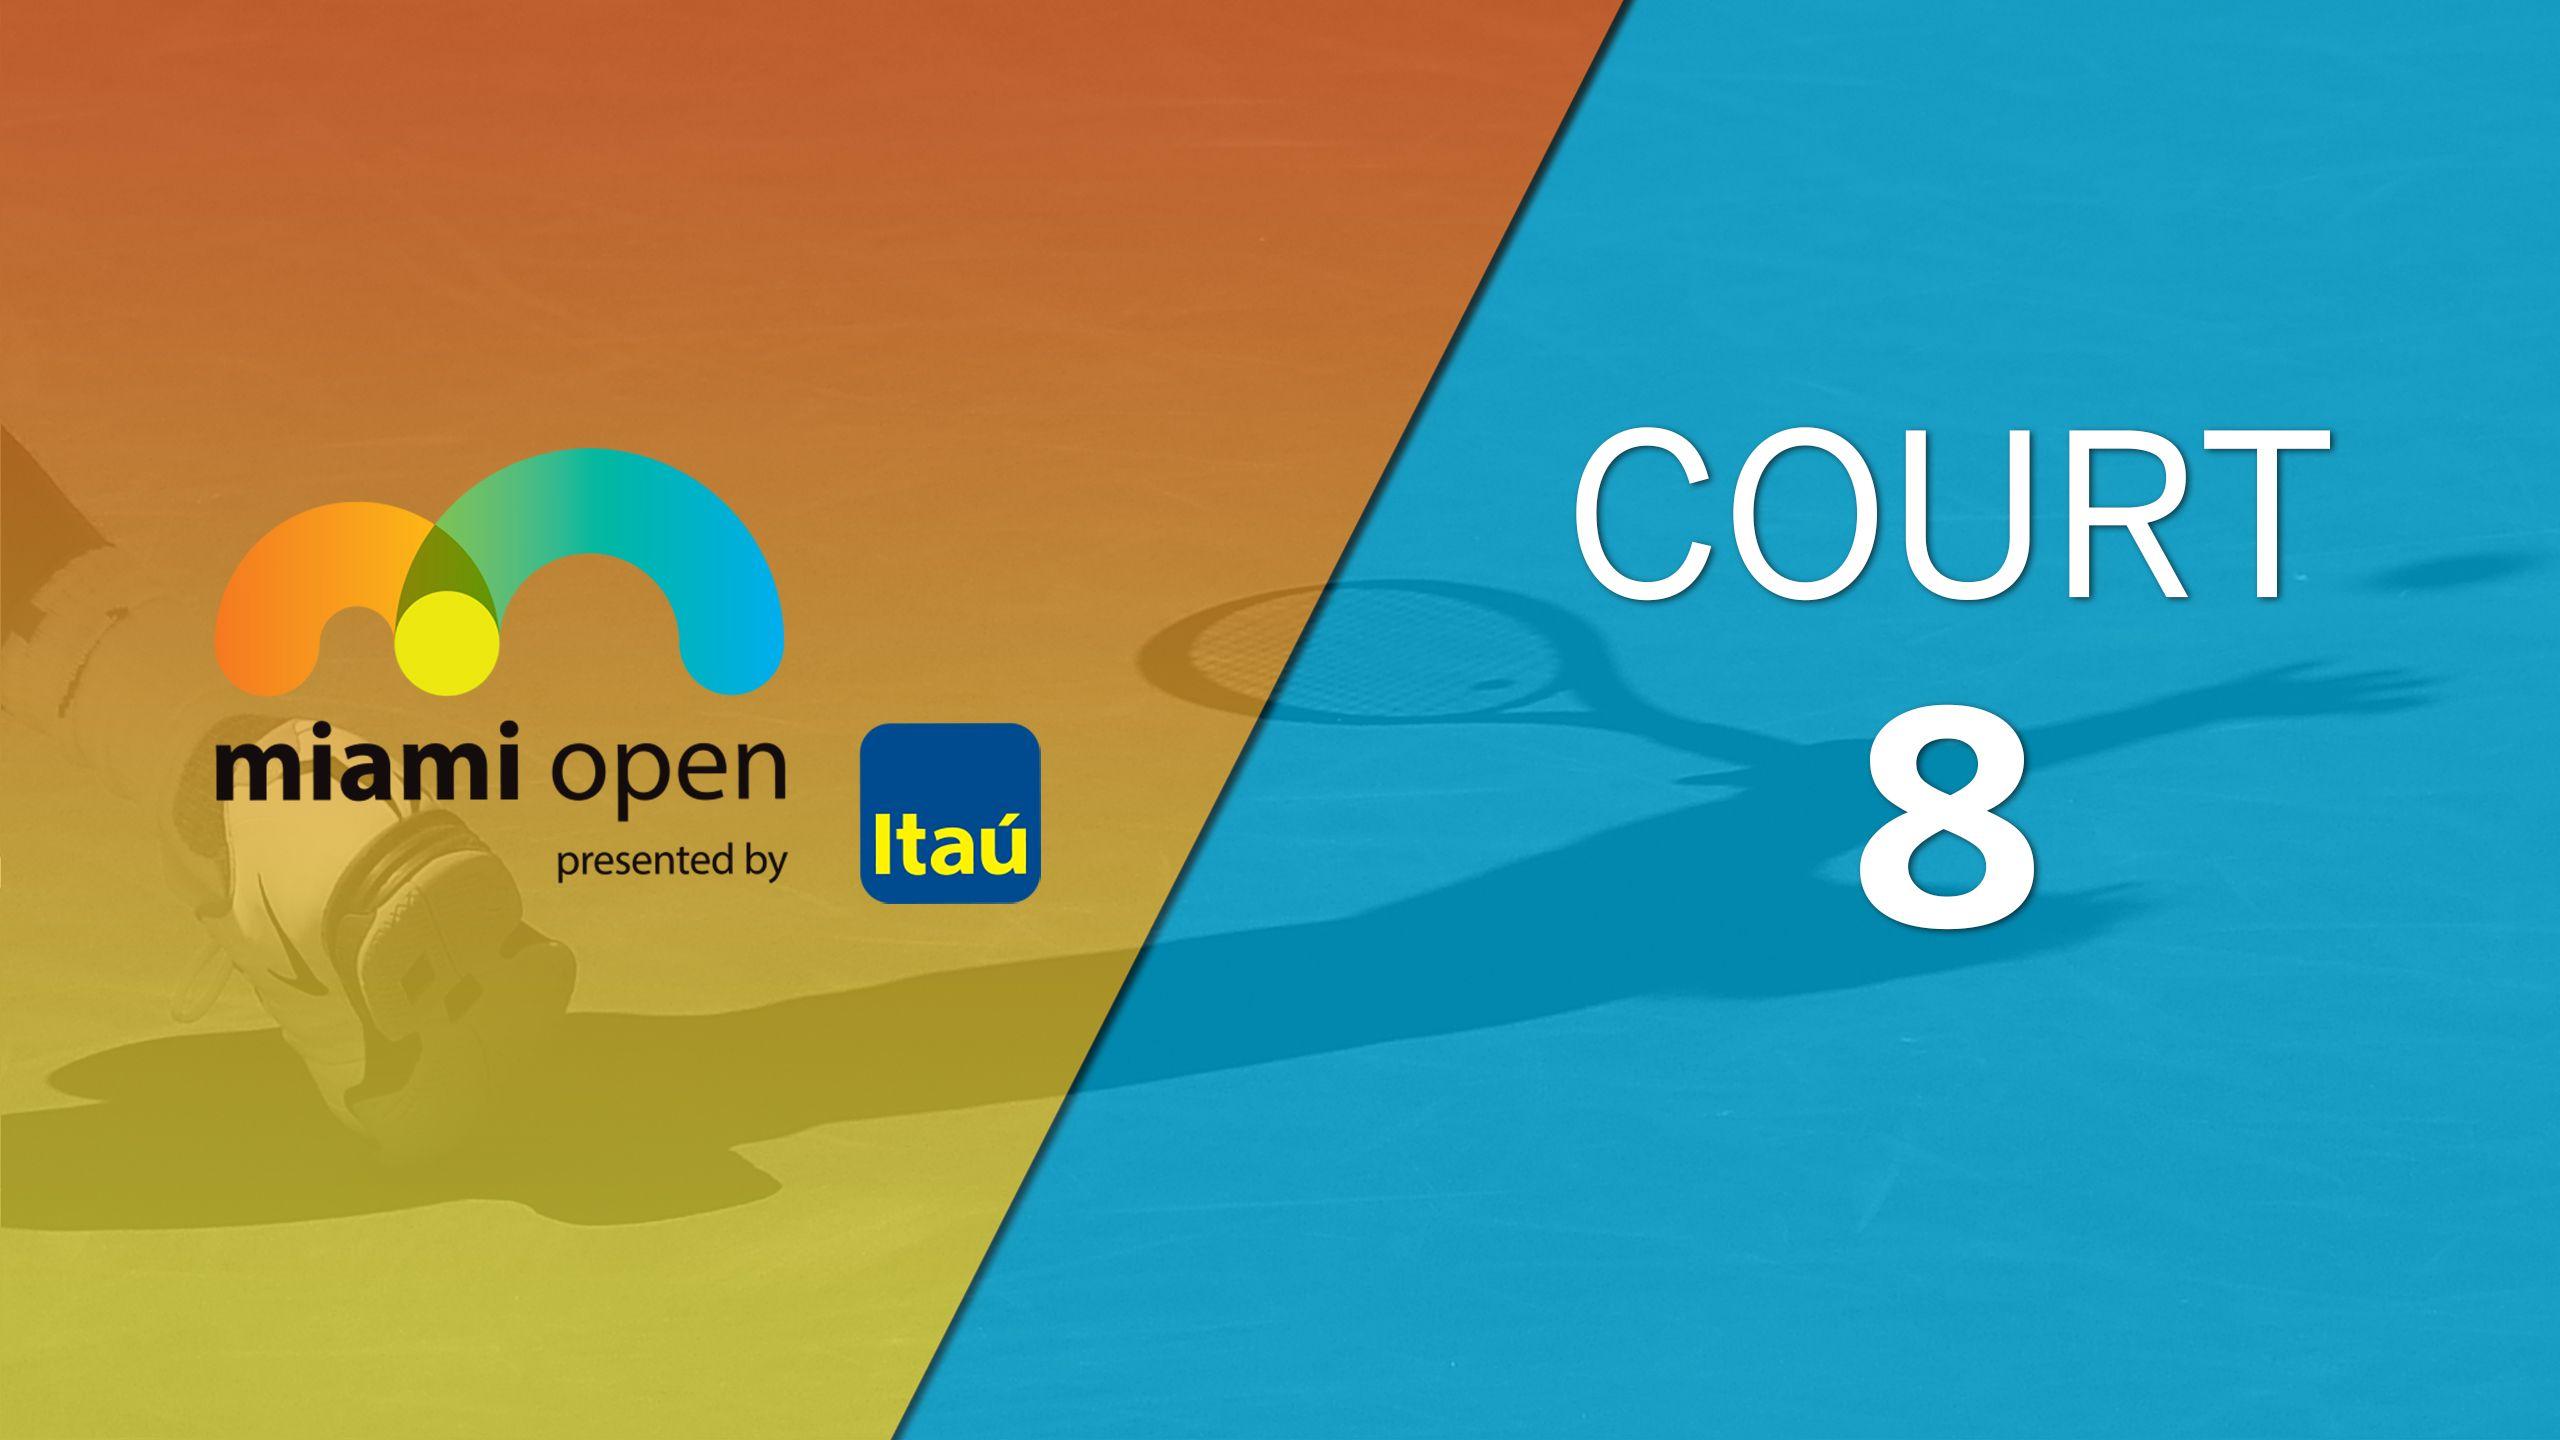 Miami Open - Court 8 (Doubles)